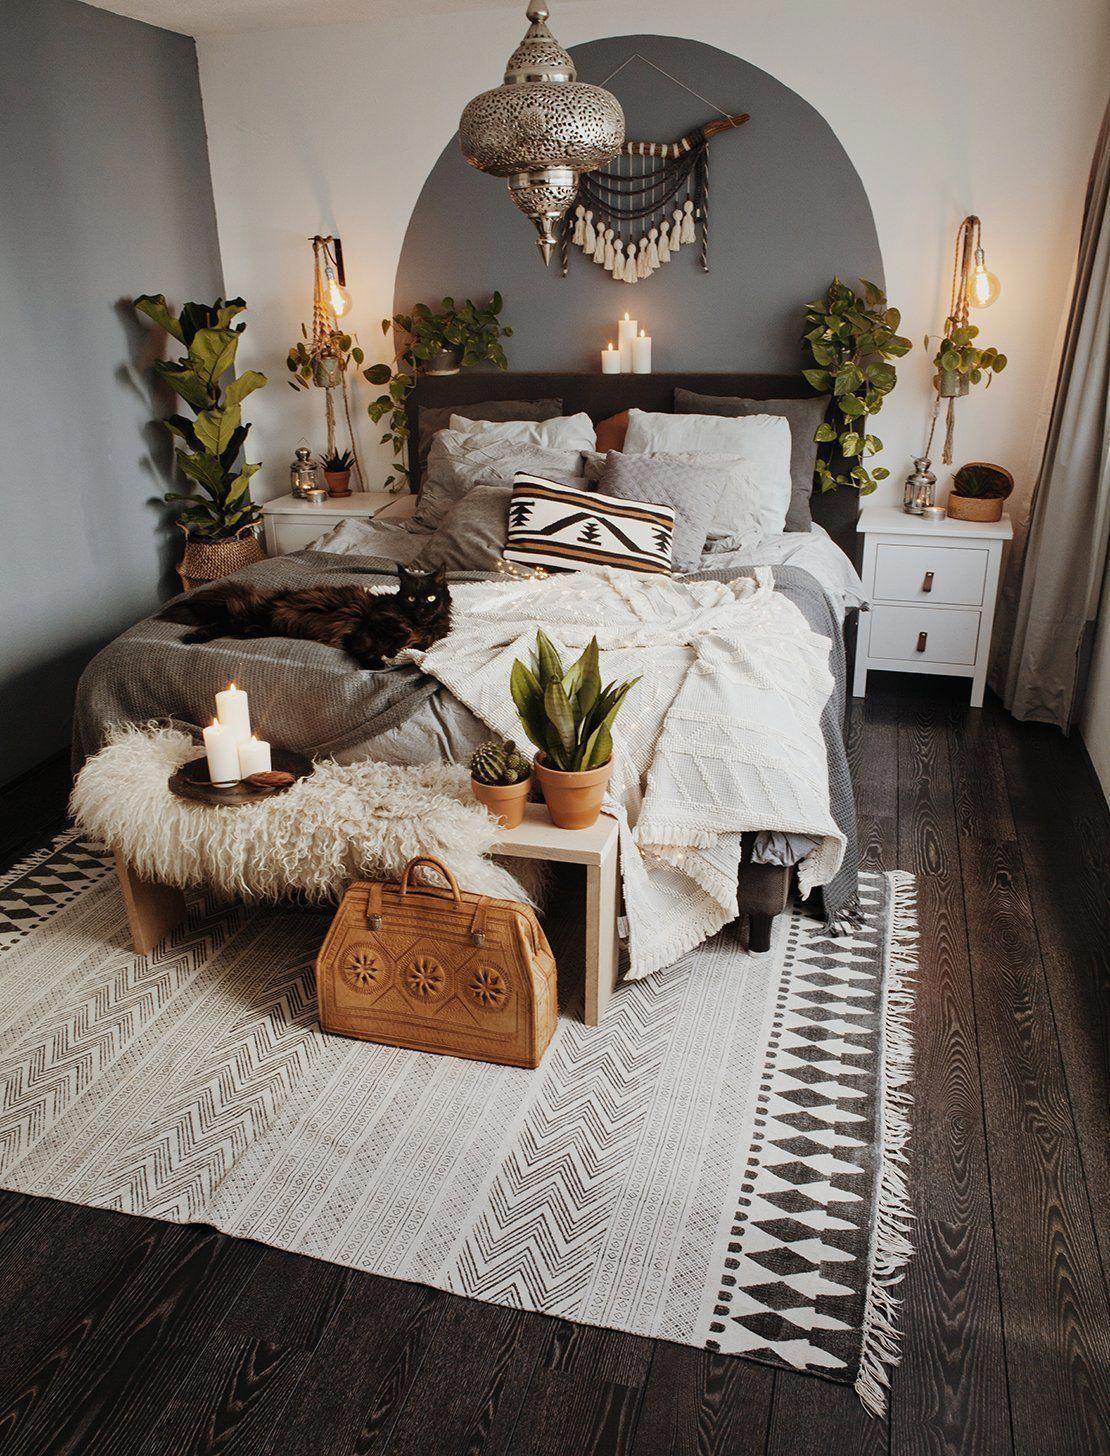 Home Decor Inspiration These Scandinavian Design Ideas Will